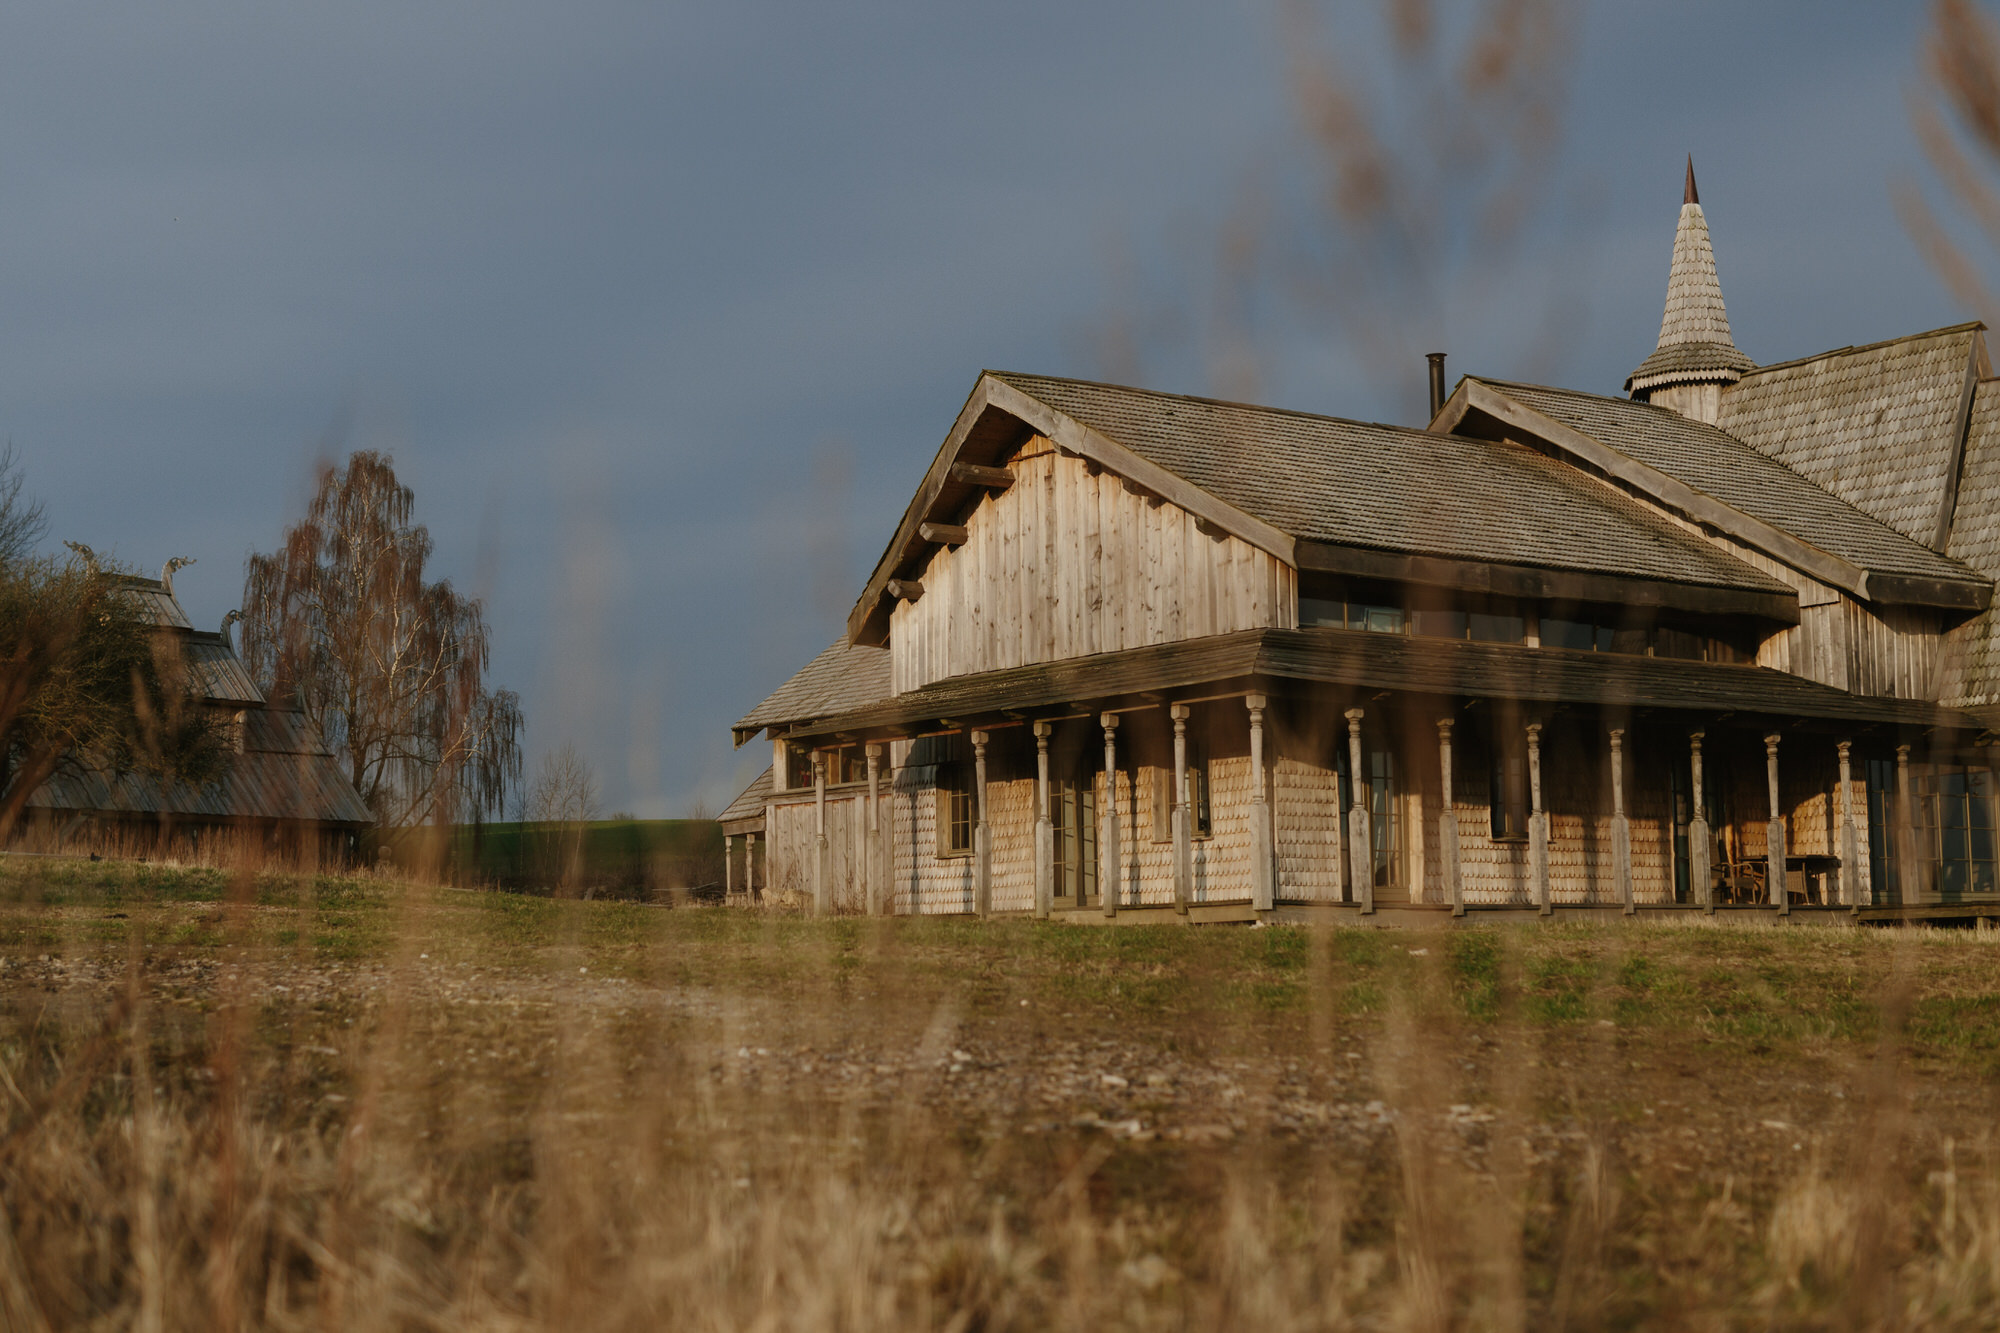 jim-lingvild-castle-home-denmark-exterior-photography.jpg